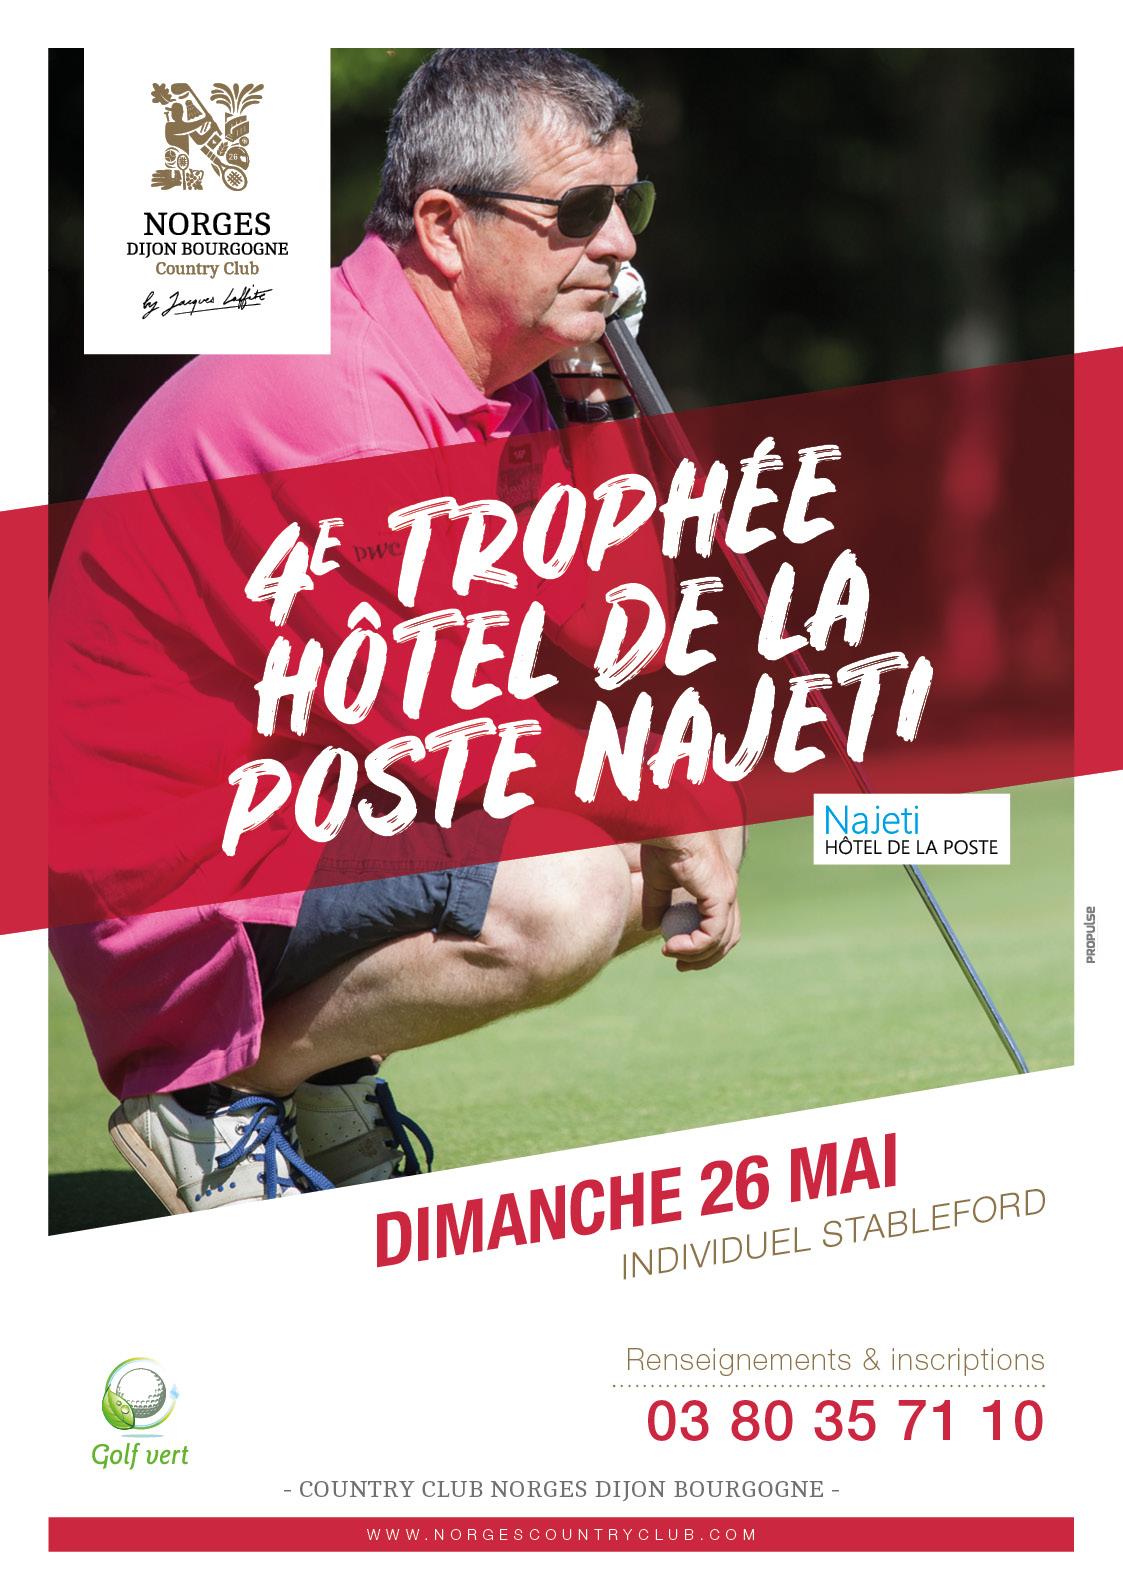 4e Trophée Hôtel de la Poste Najeti